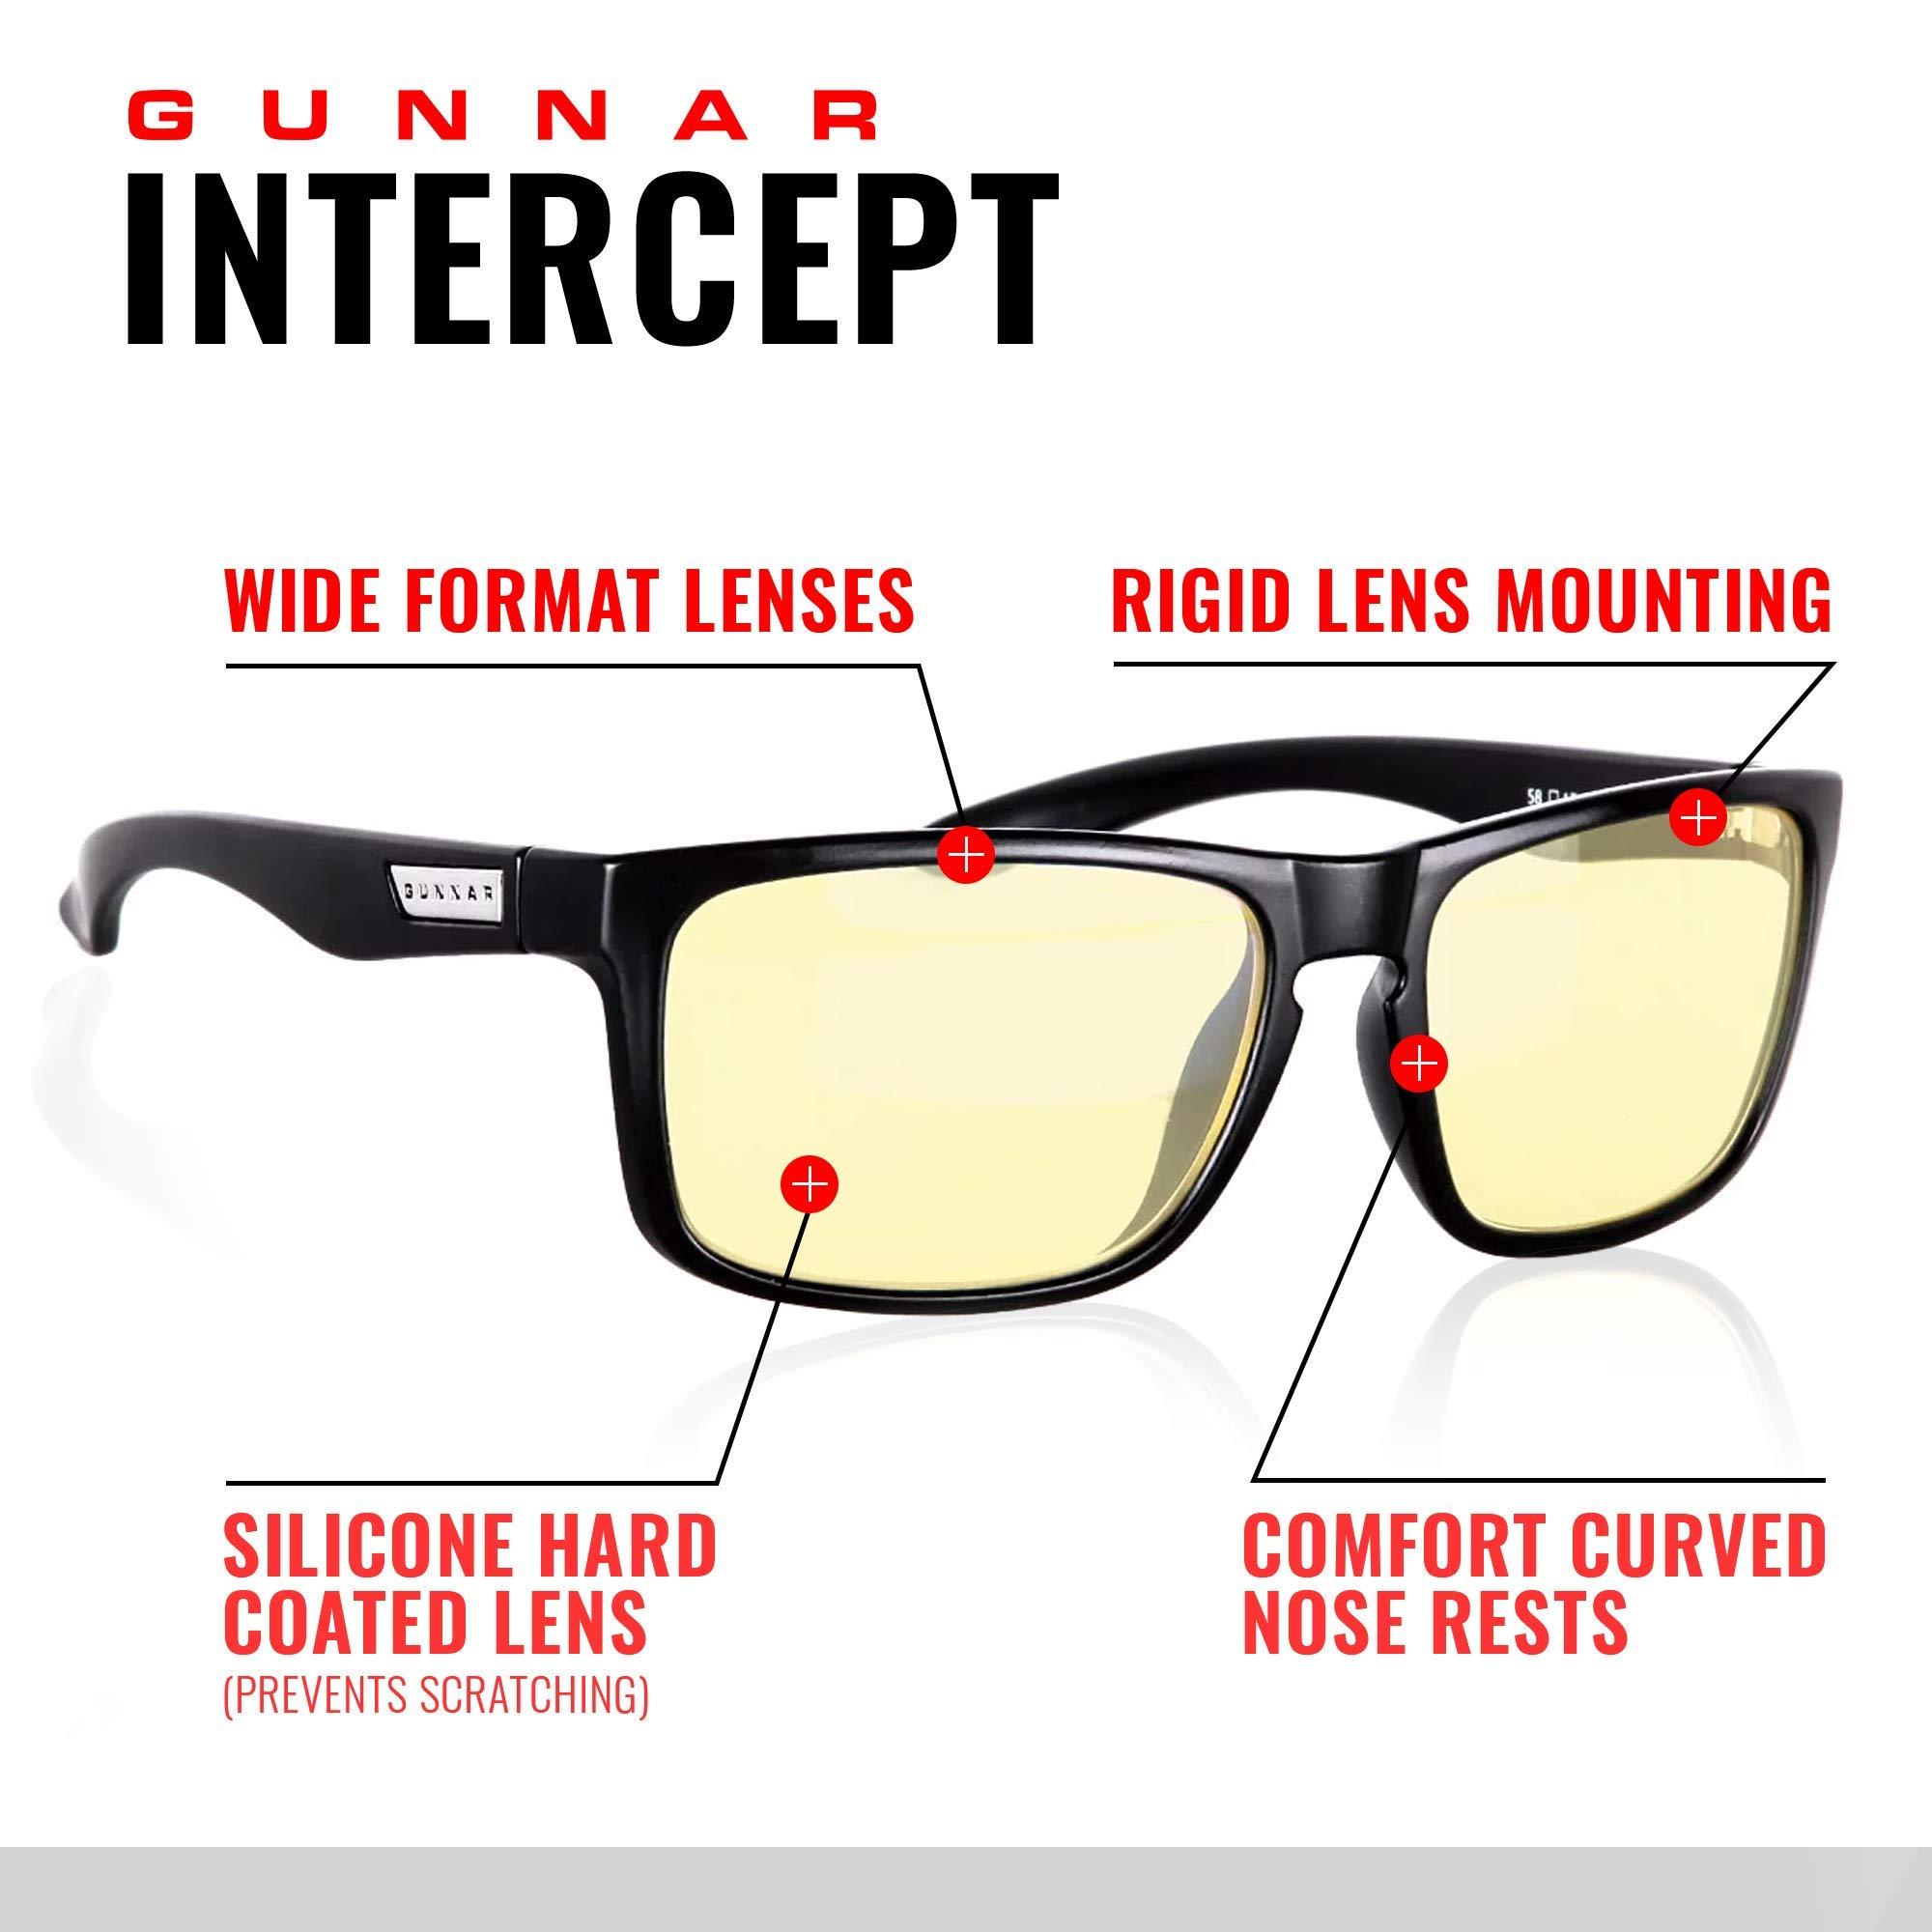 GUNNAR Gaming and Computer Eyewear /Intercept, Amber Tint - Patented Lens, Reduce Digital Eye Strain, Block 65% of Harmful Blue Light by Gunnar Optiks (Image #2)